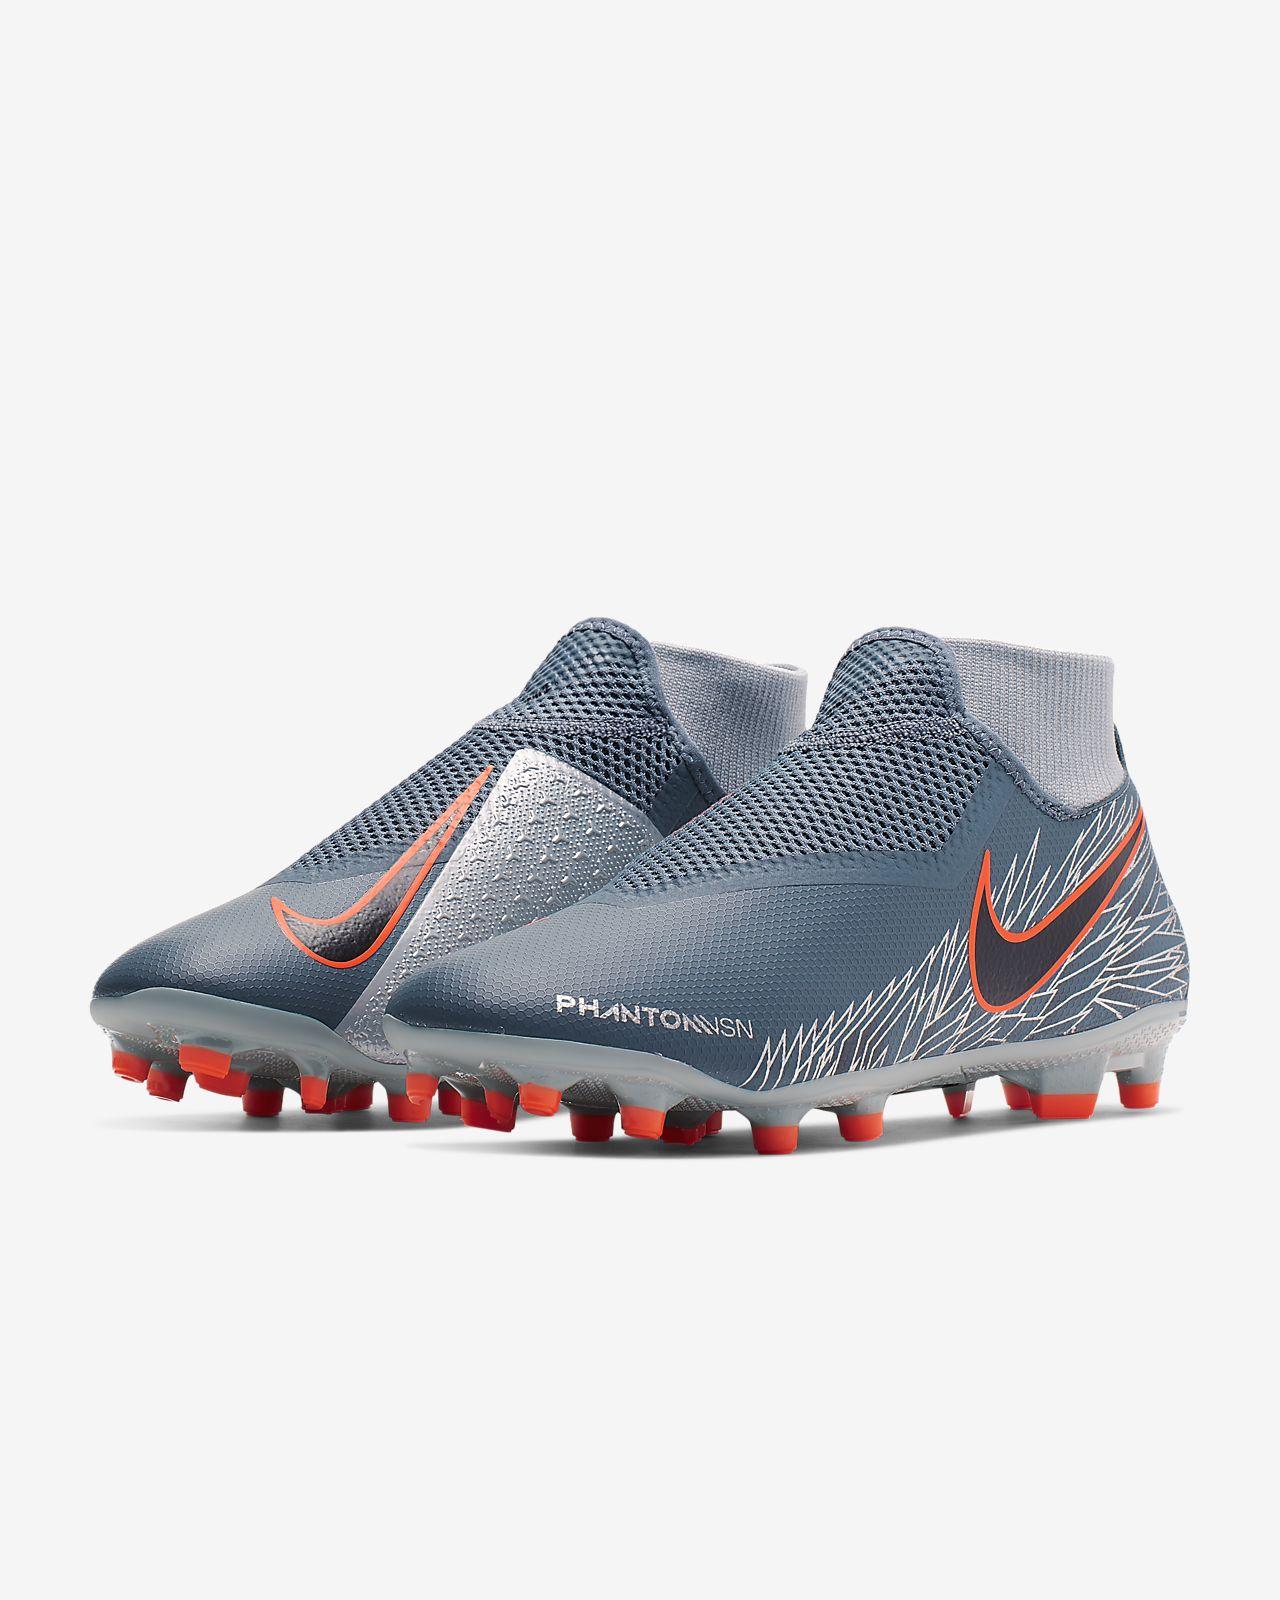 e1c32aac5 ... Nike Phantom Vision Academy Dynamic Fit MG Botas de fútbol para  múltiples superficies